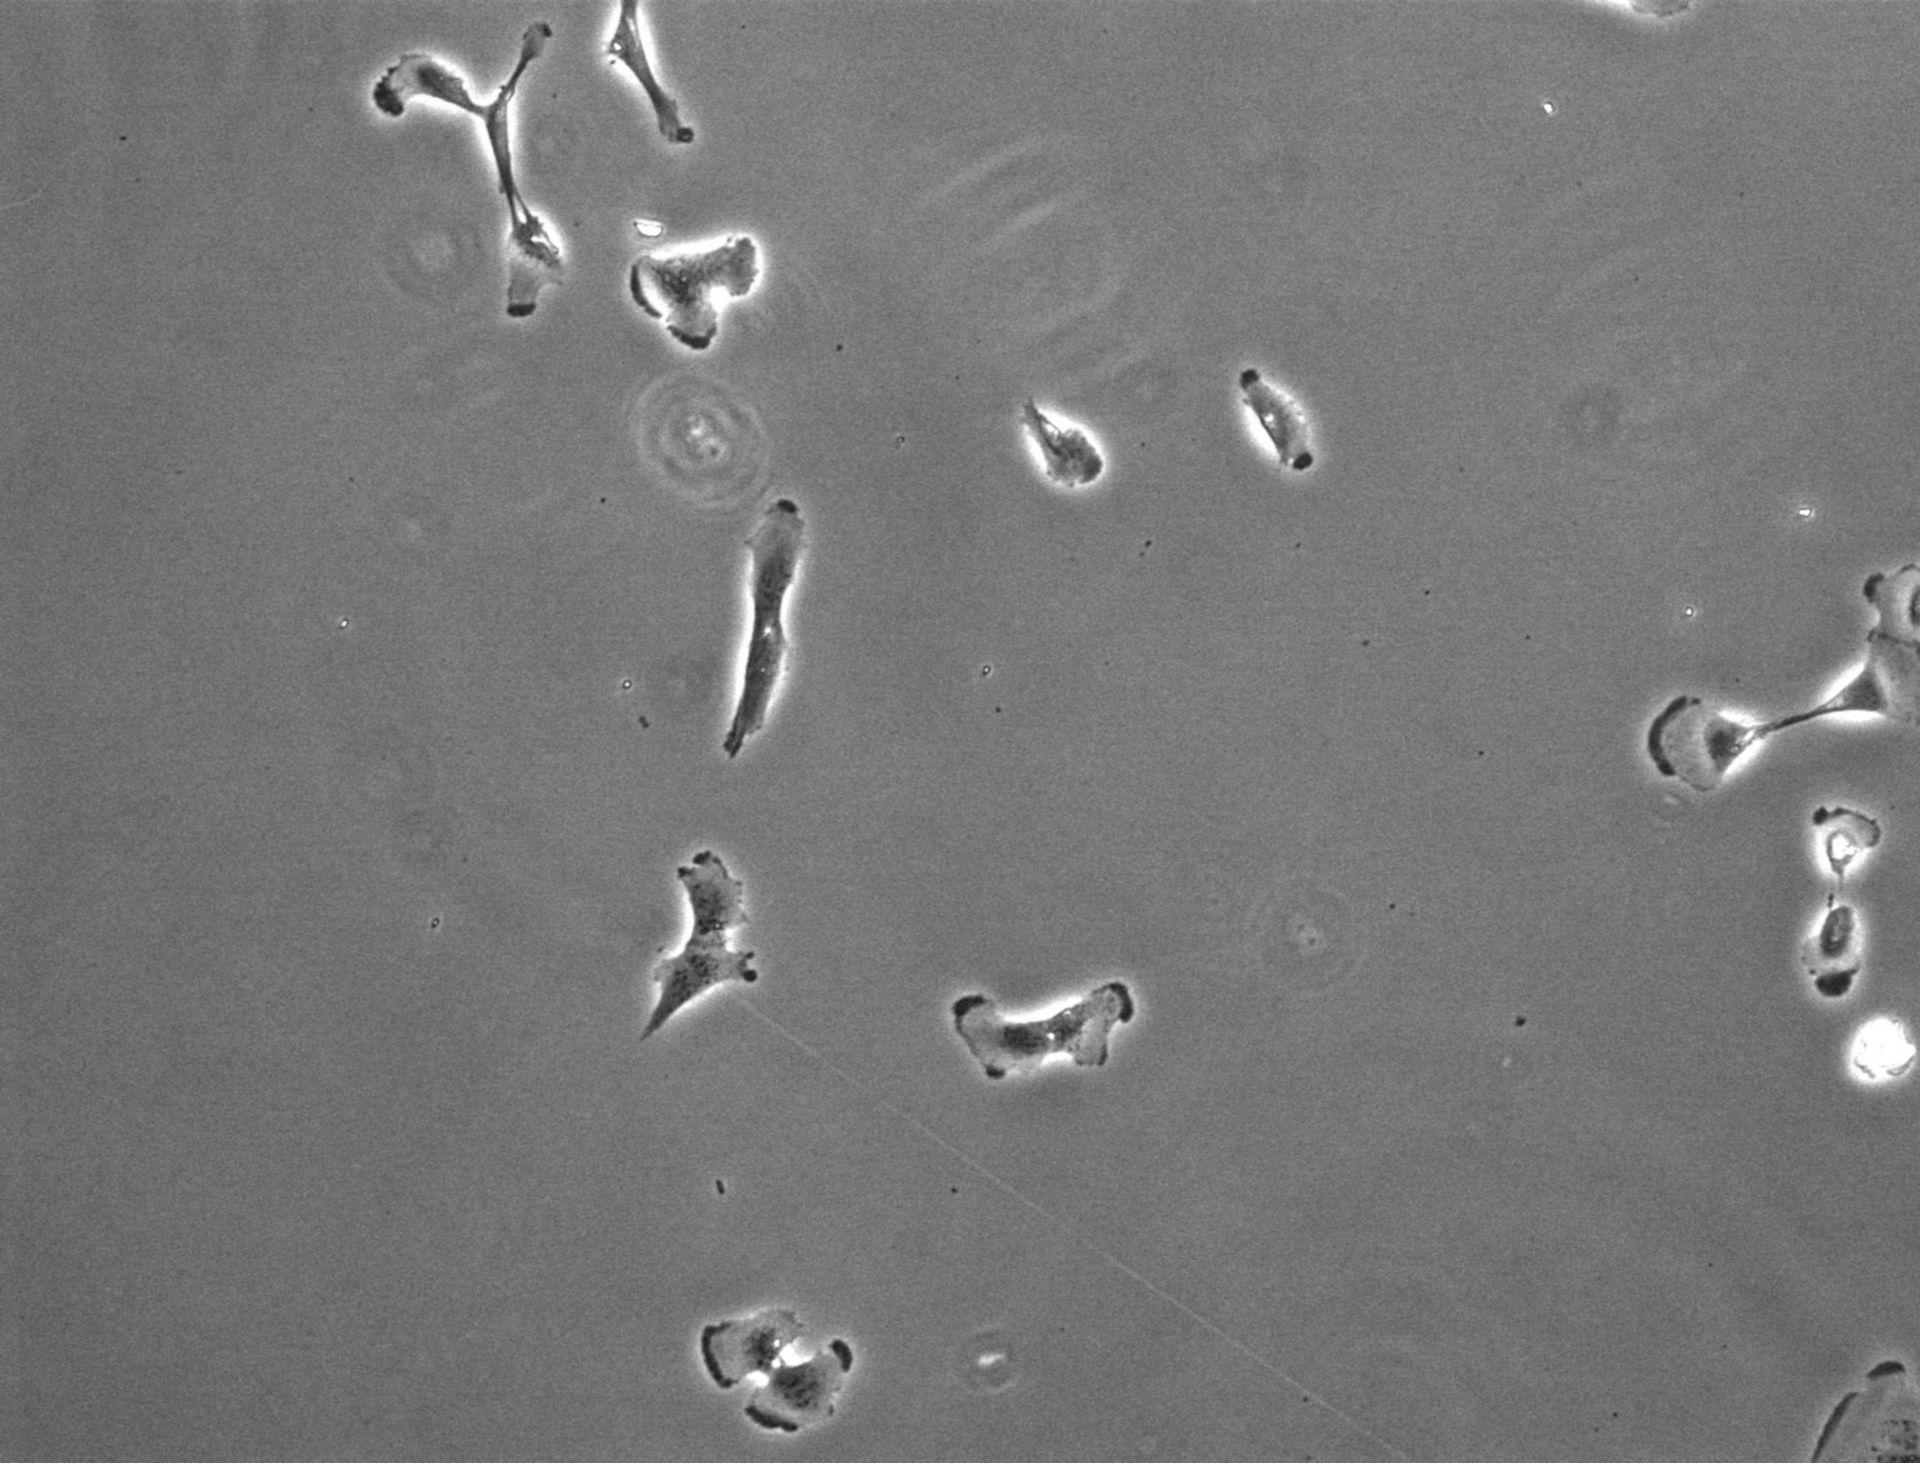 Homo sapiens (Retinal pigment epithelium) - CIL:27831